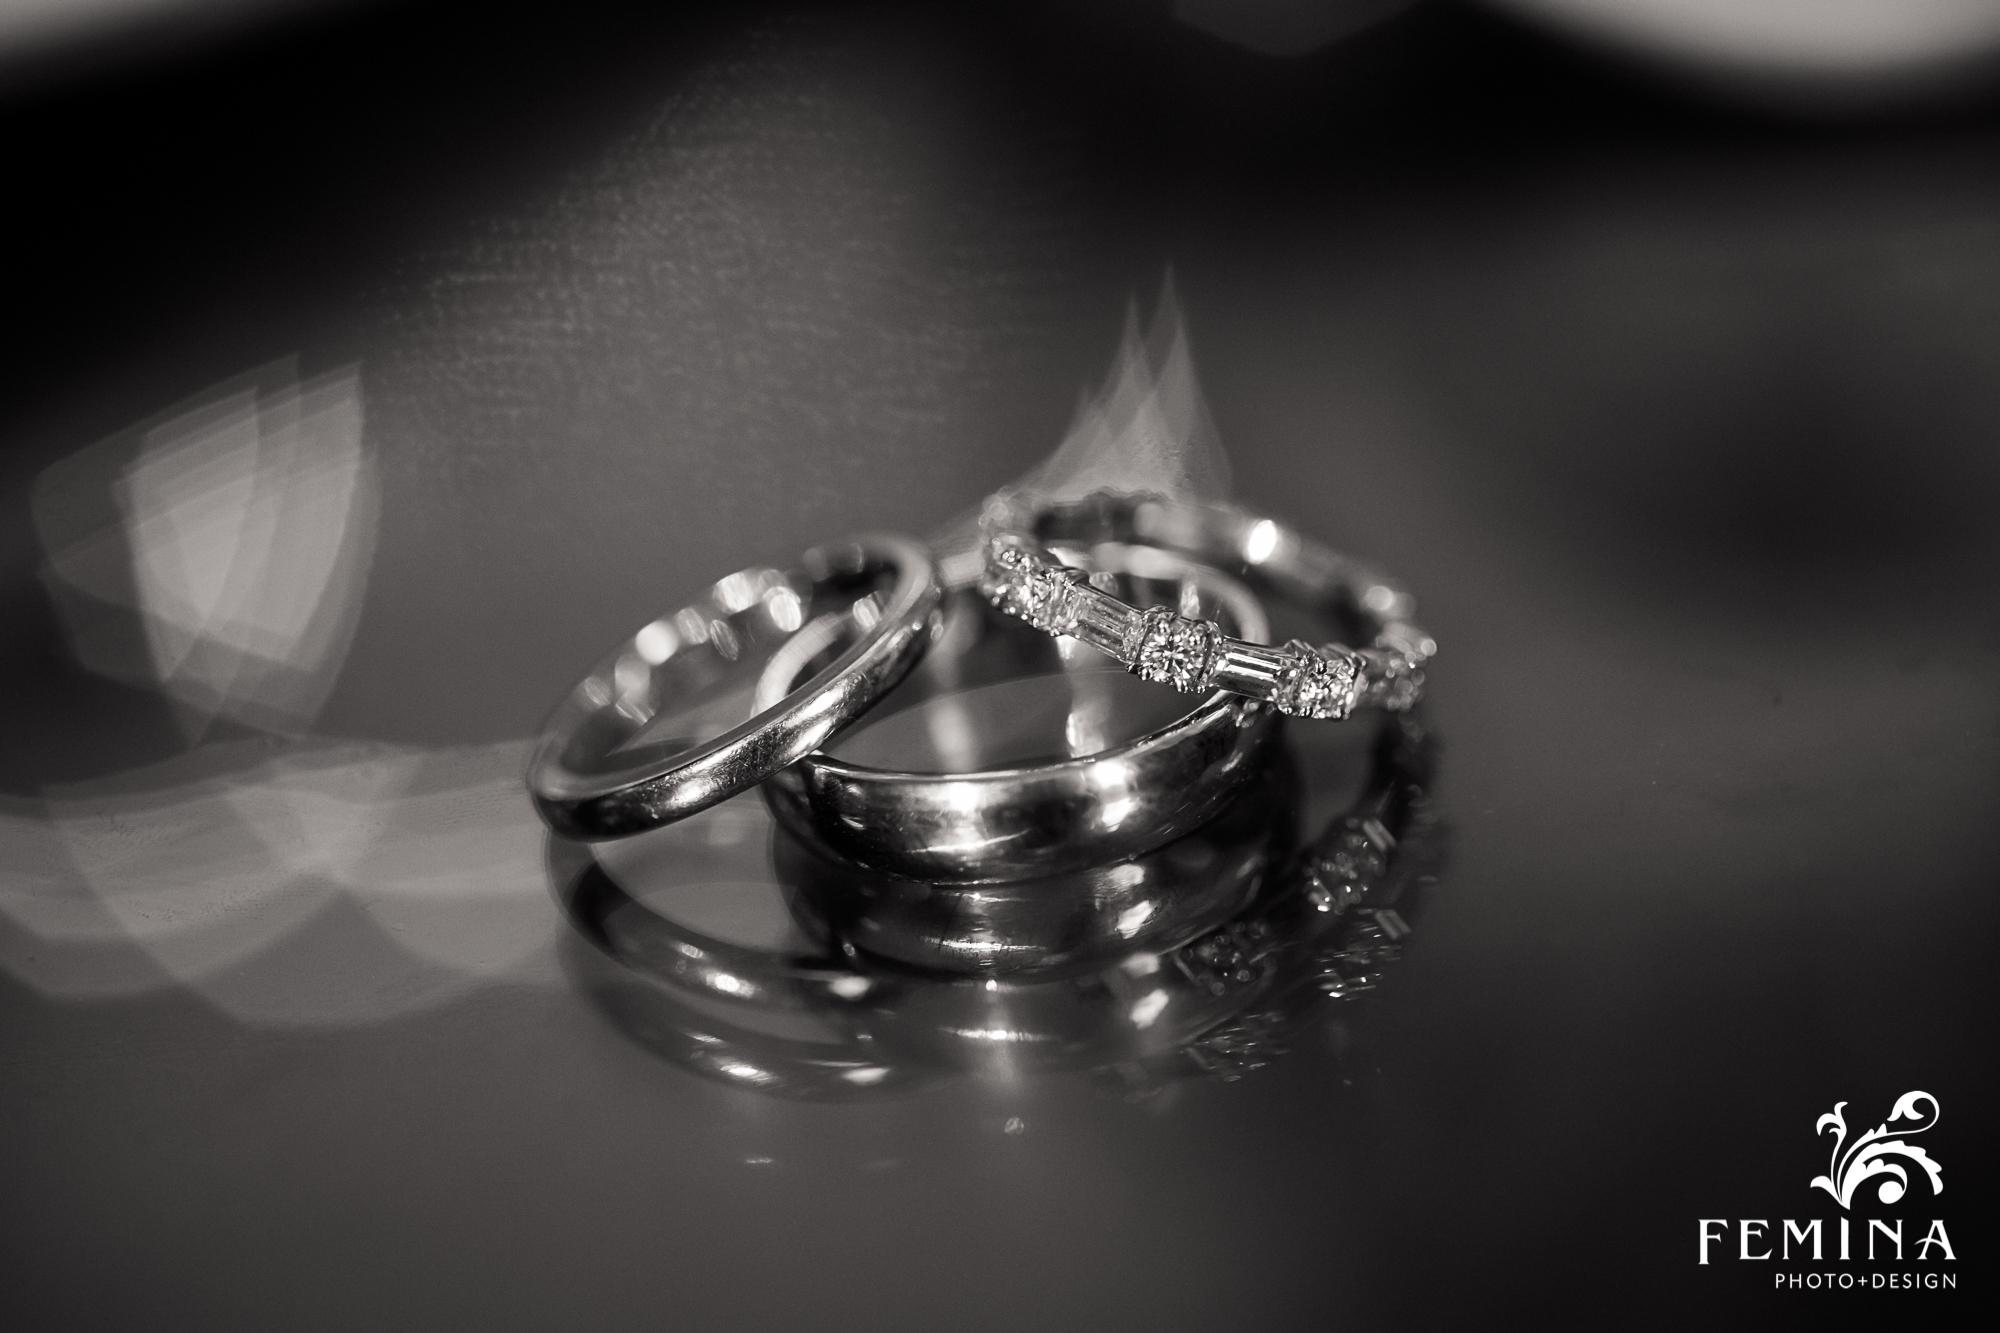 Wedding rings set upon a reflective table